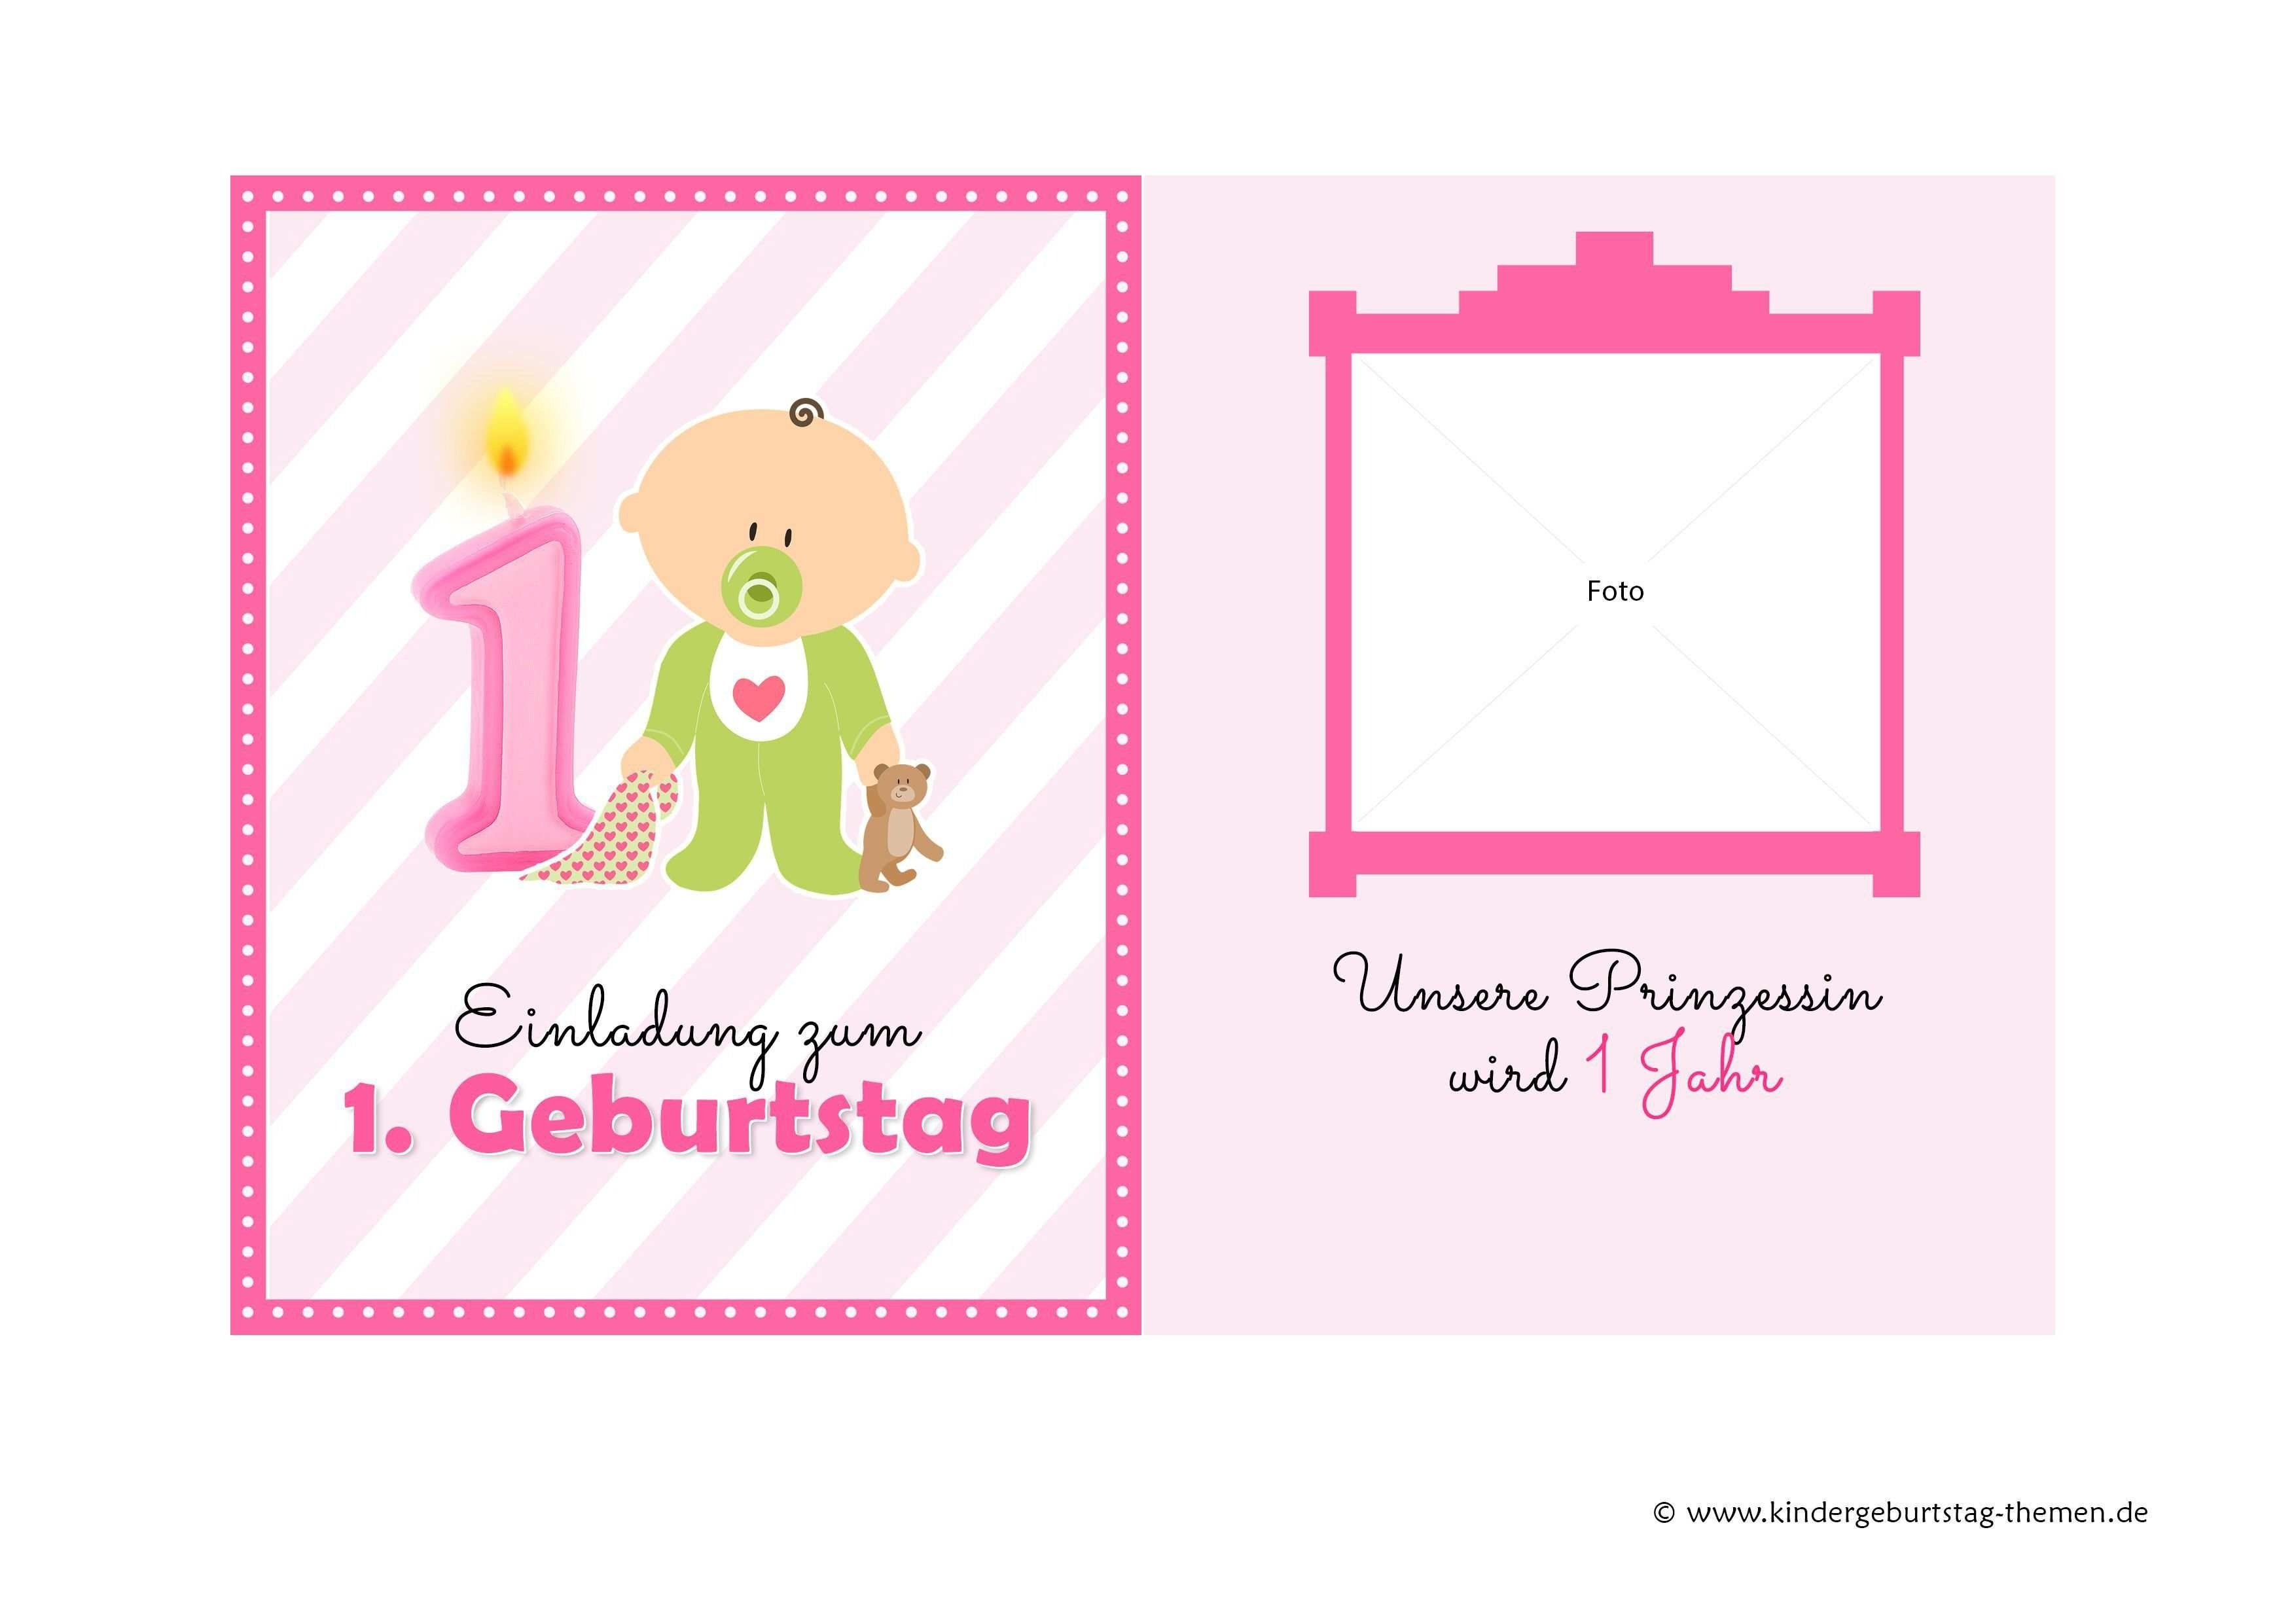 Einladung Geburtstag Einladung 1 Geburtstag Geburstag Einladungskarten Einladung Geburtstag Textvorlagen Einladung Geburtstag Einladungskarten Geburtstag